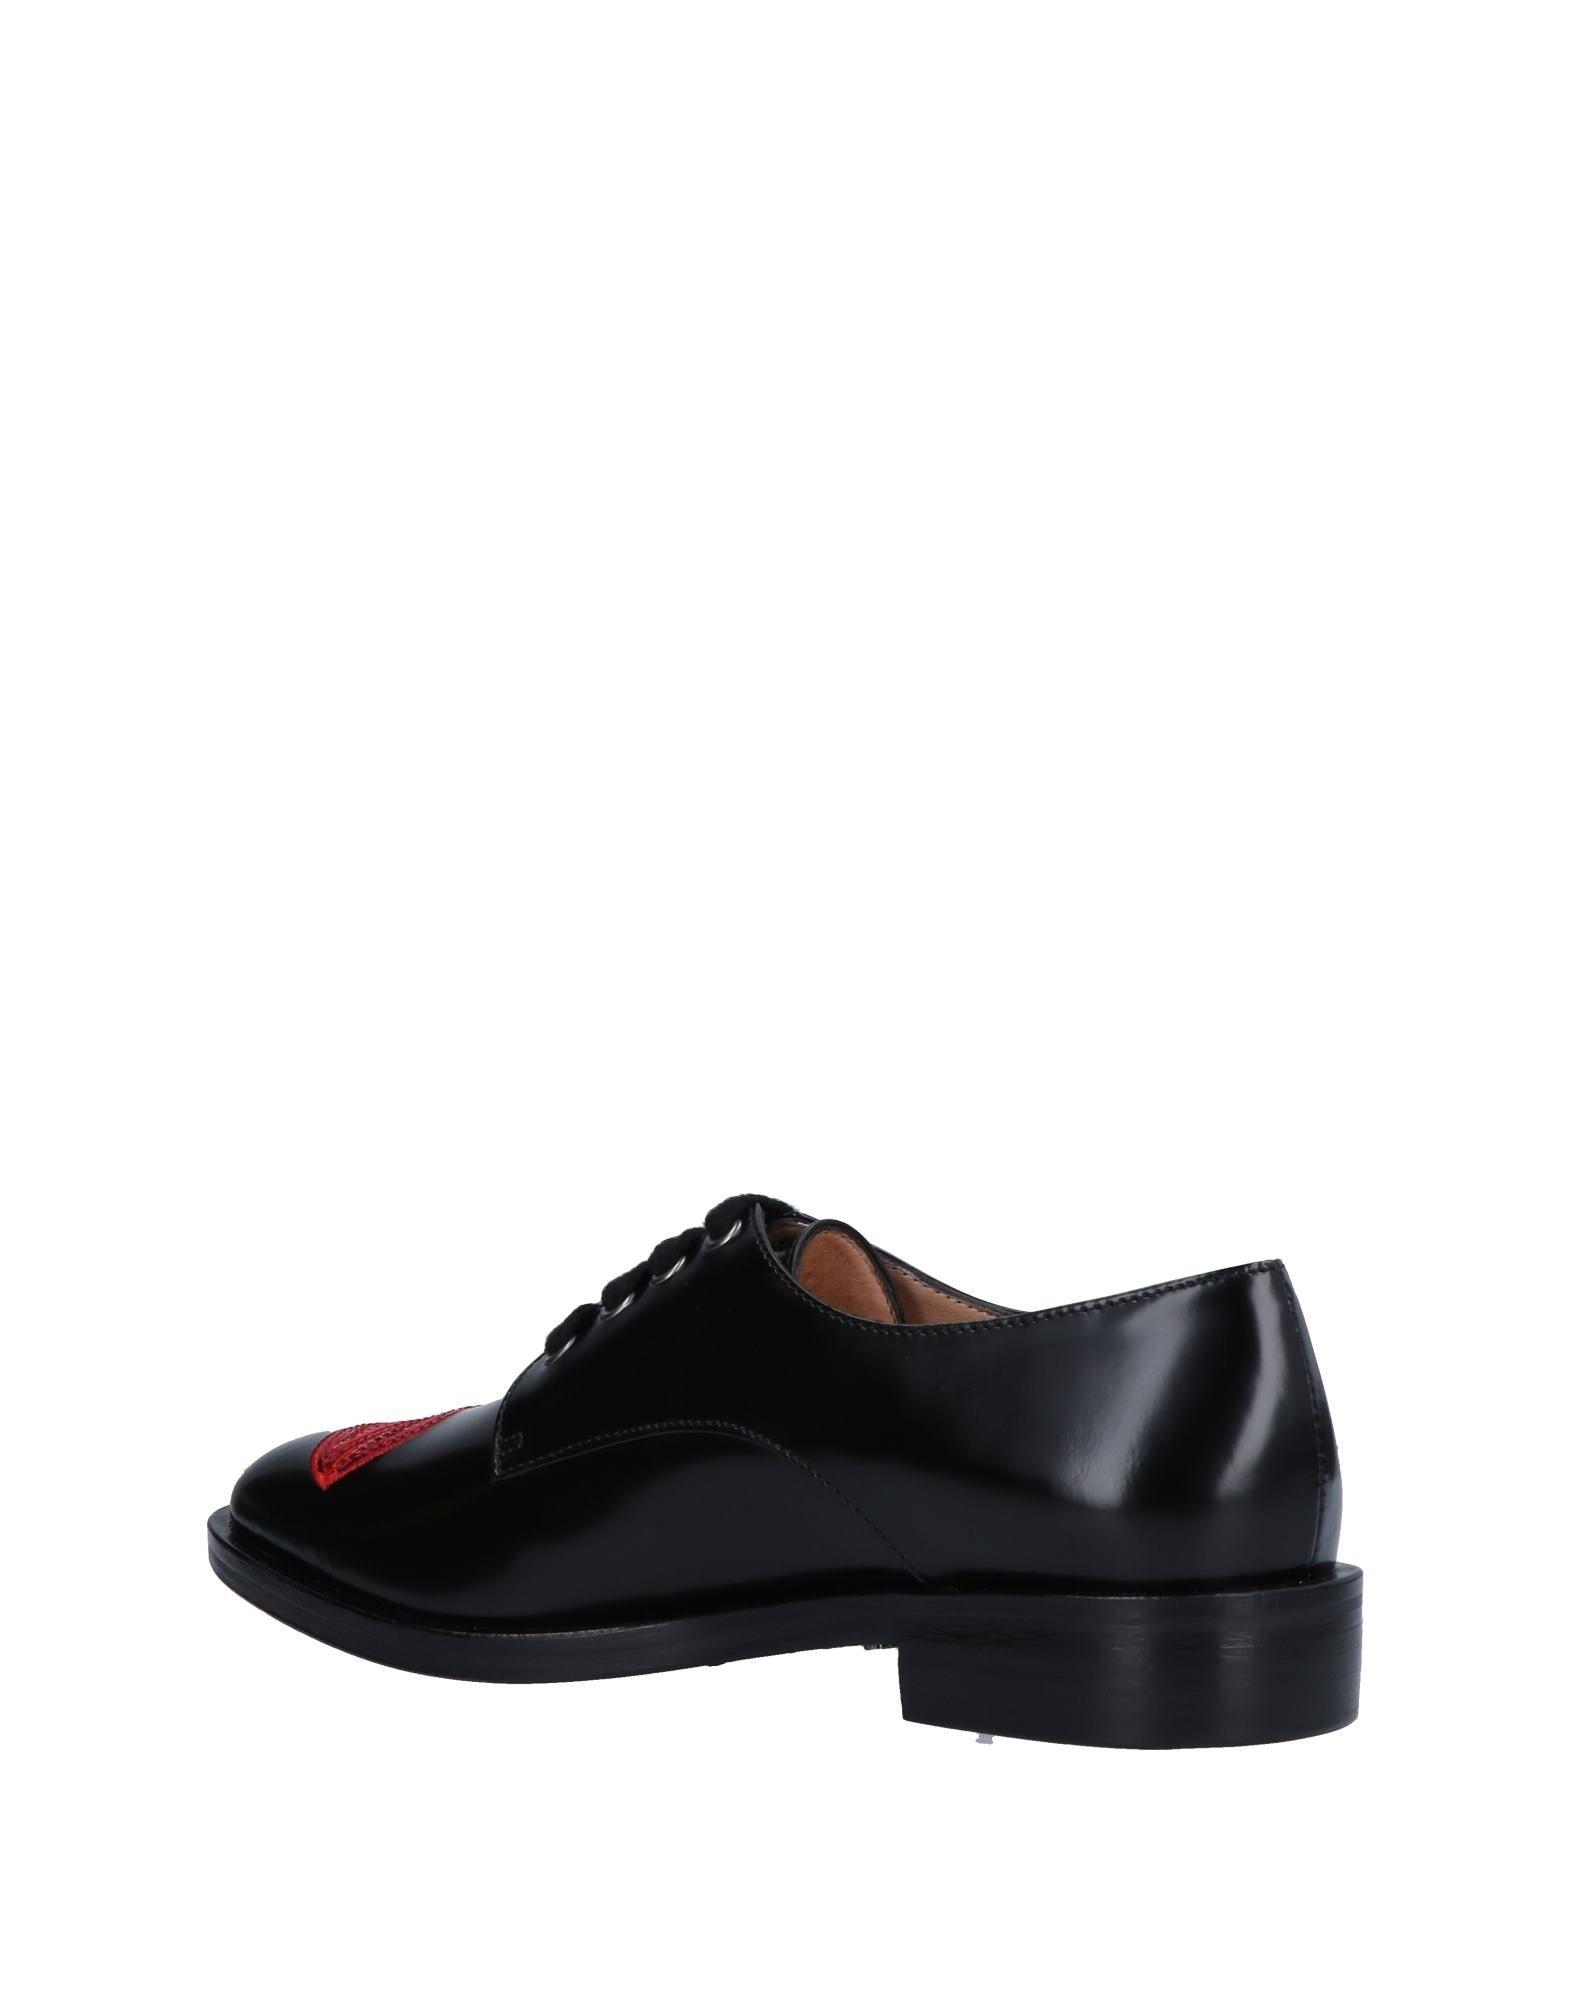 Markus Lupfer Schnürschuhe 11322576ED Damen  11322576ED Schnürschuhe Beliebte Schuhe 0ed7f5